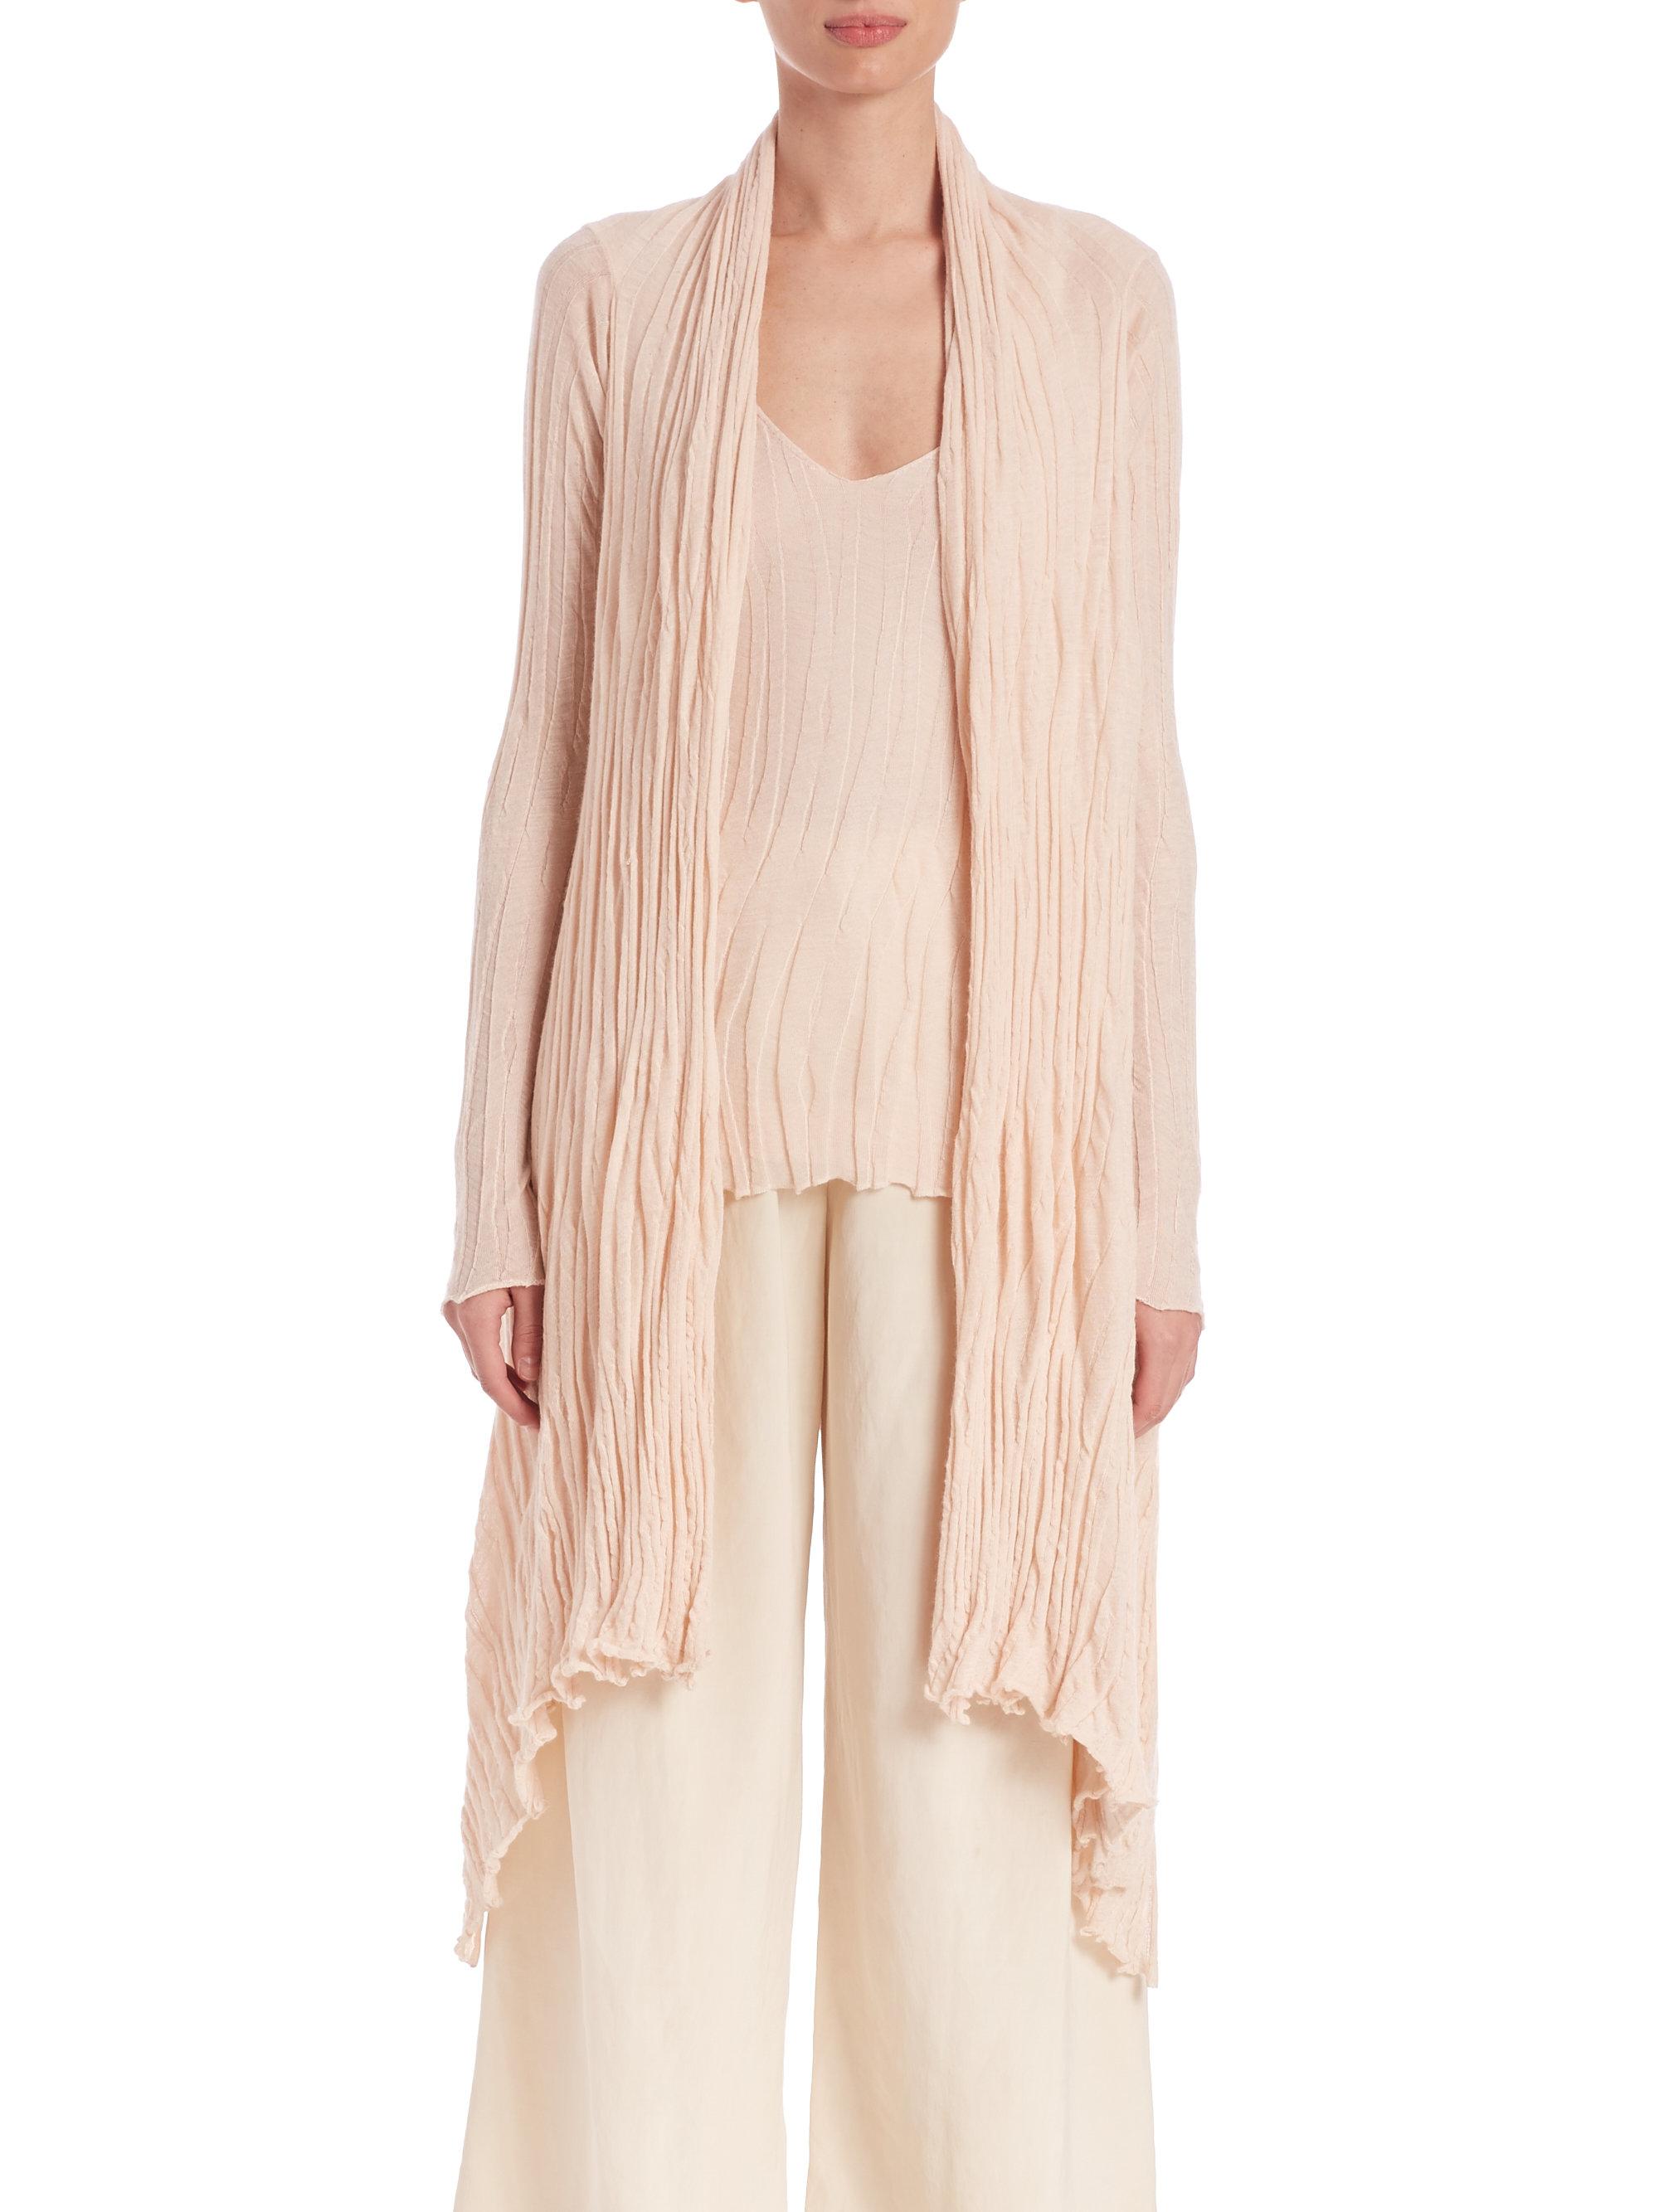 b0037c3694dc32 Donna Karan Asymmetrical Cashmere & Silk Cardigan in Pink - Lyst